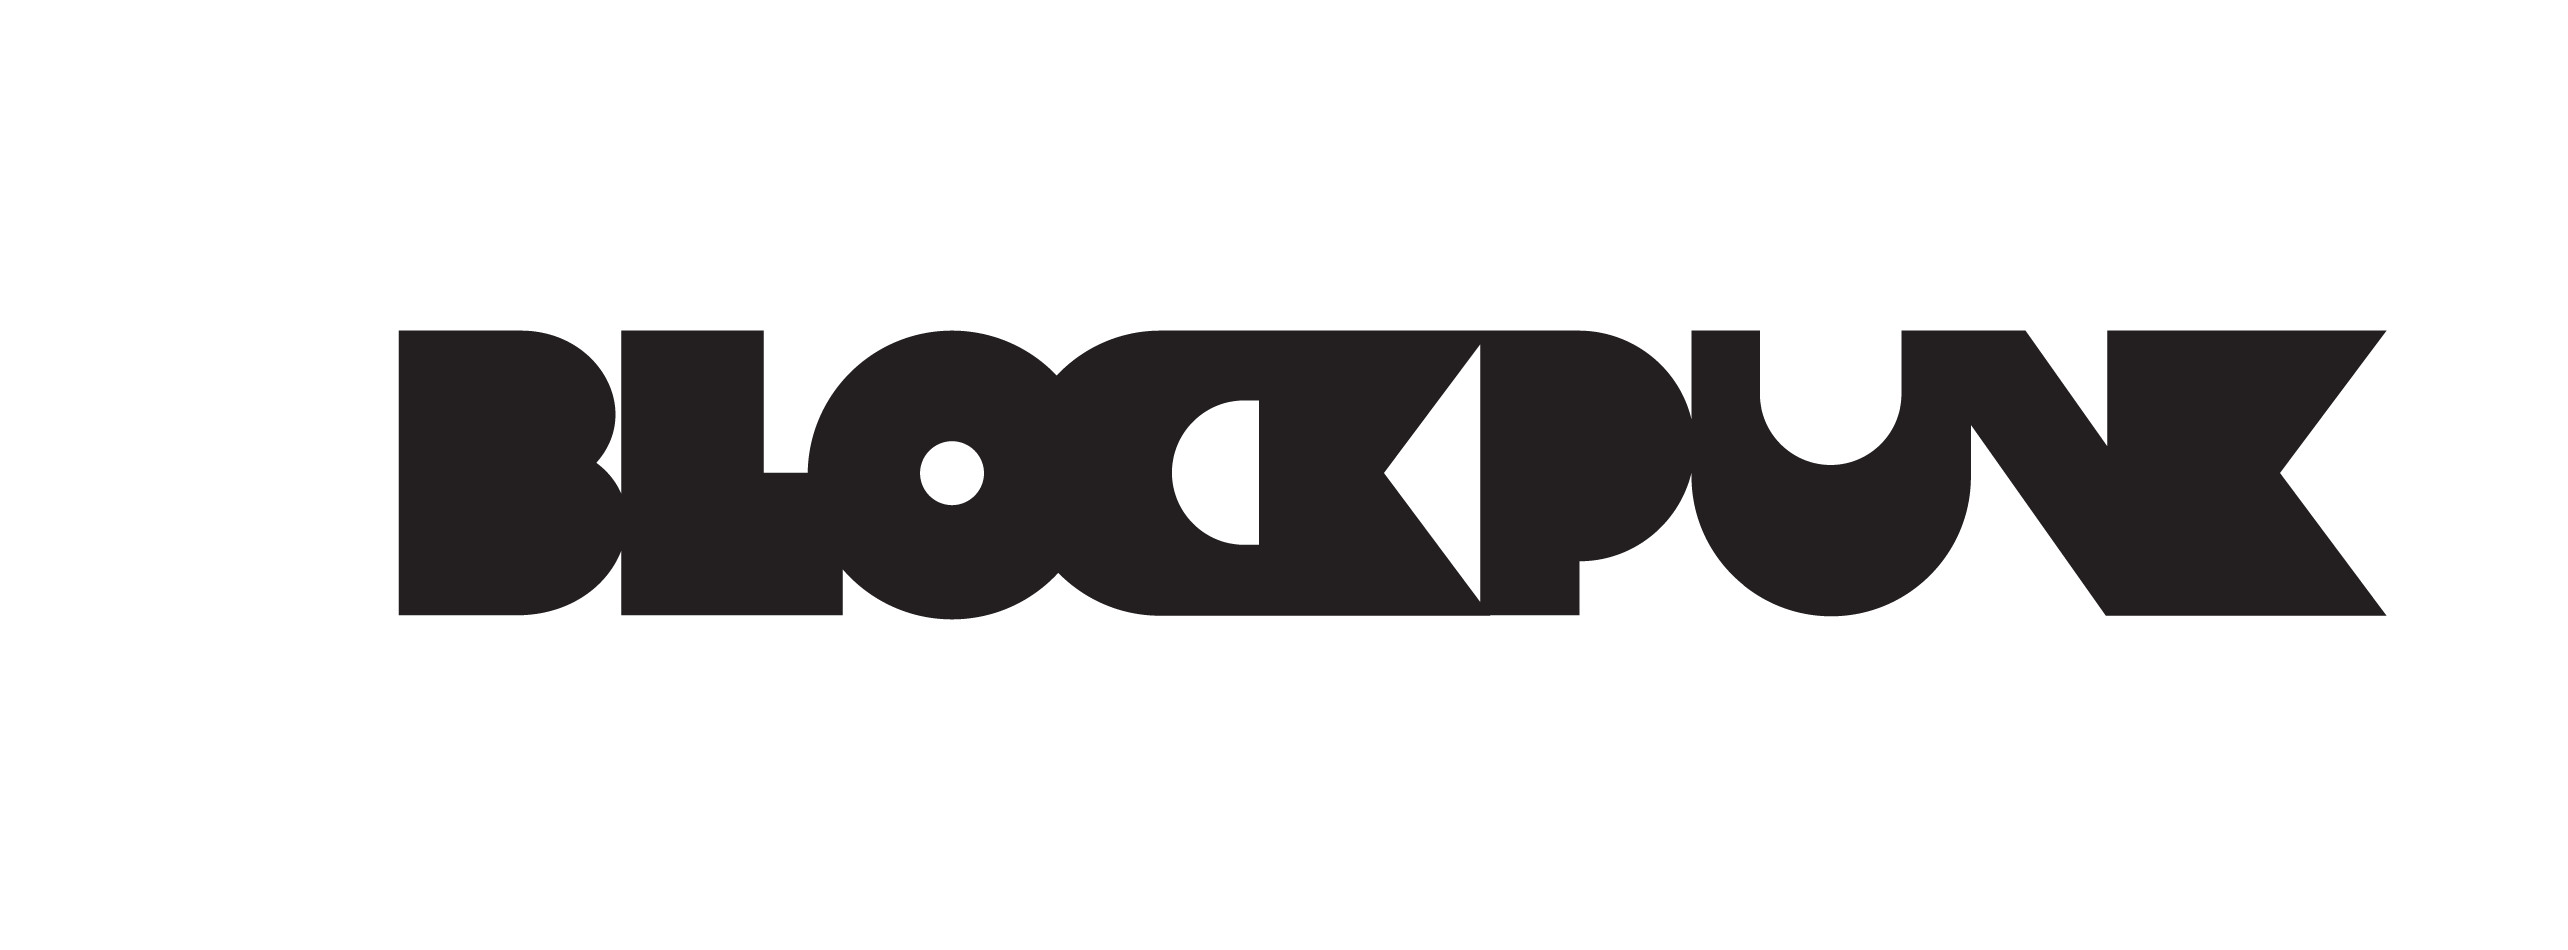 BlockPunk2